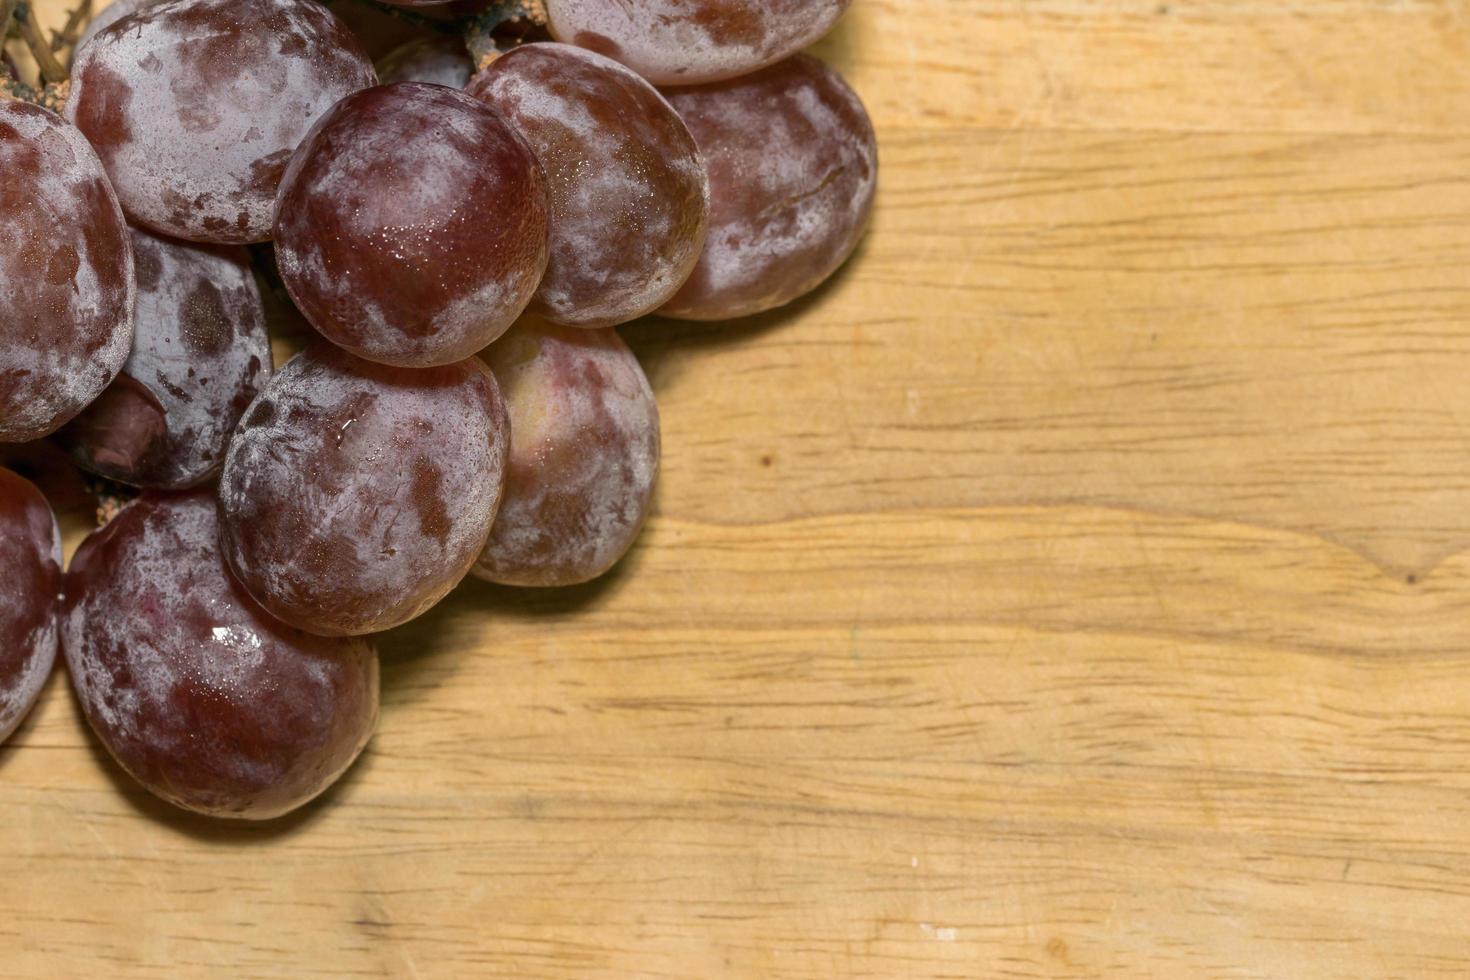 macro druiven op houten tafel foto